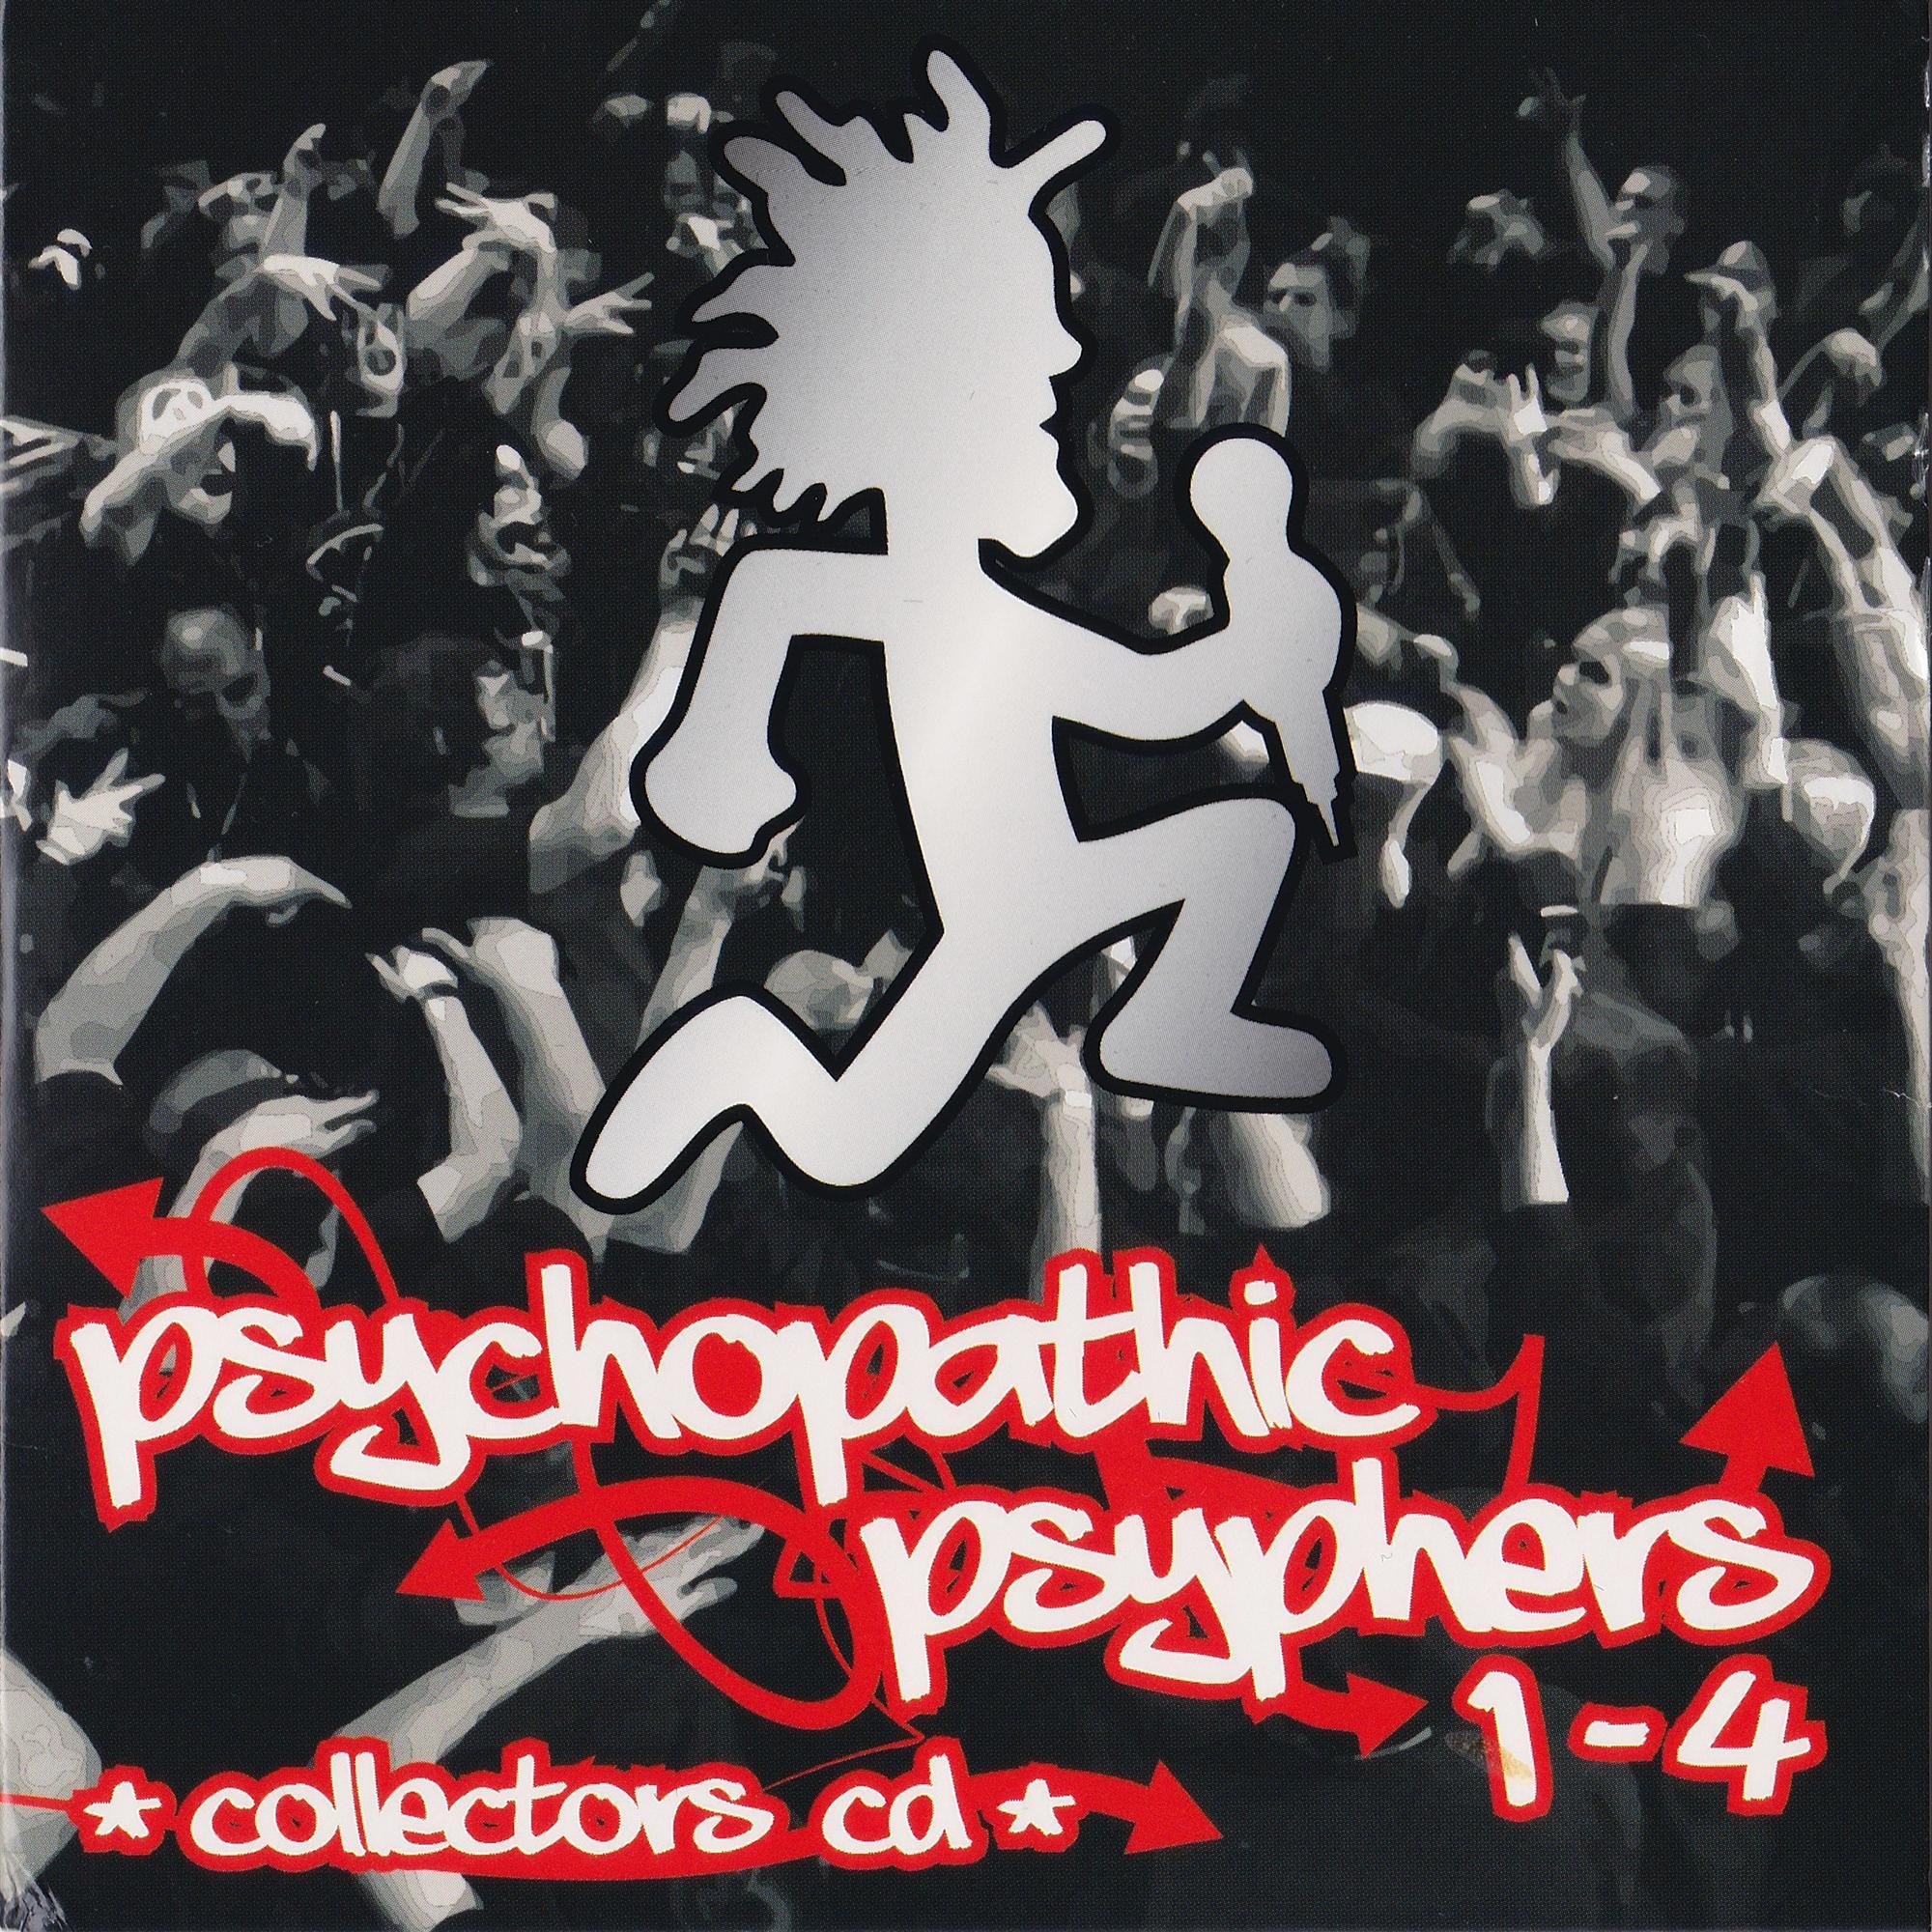 Psychopathic Records Wallpaper Psychopathic psyphers album 2000x2000